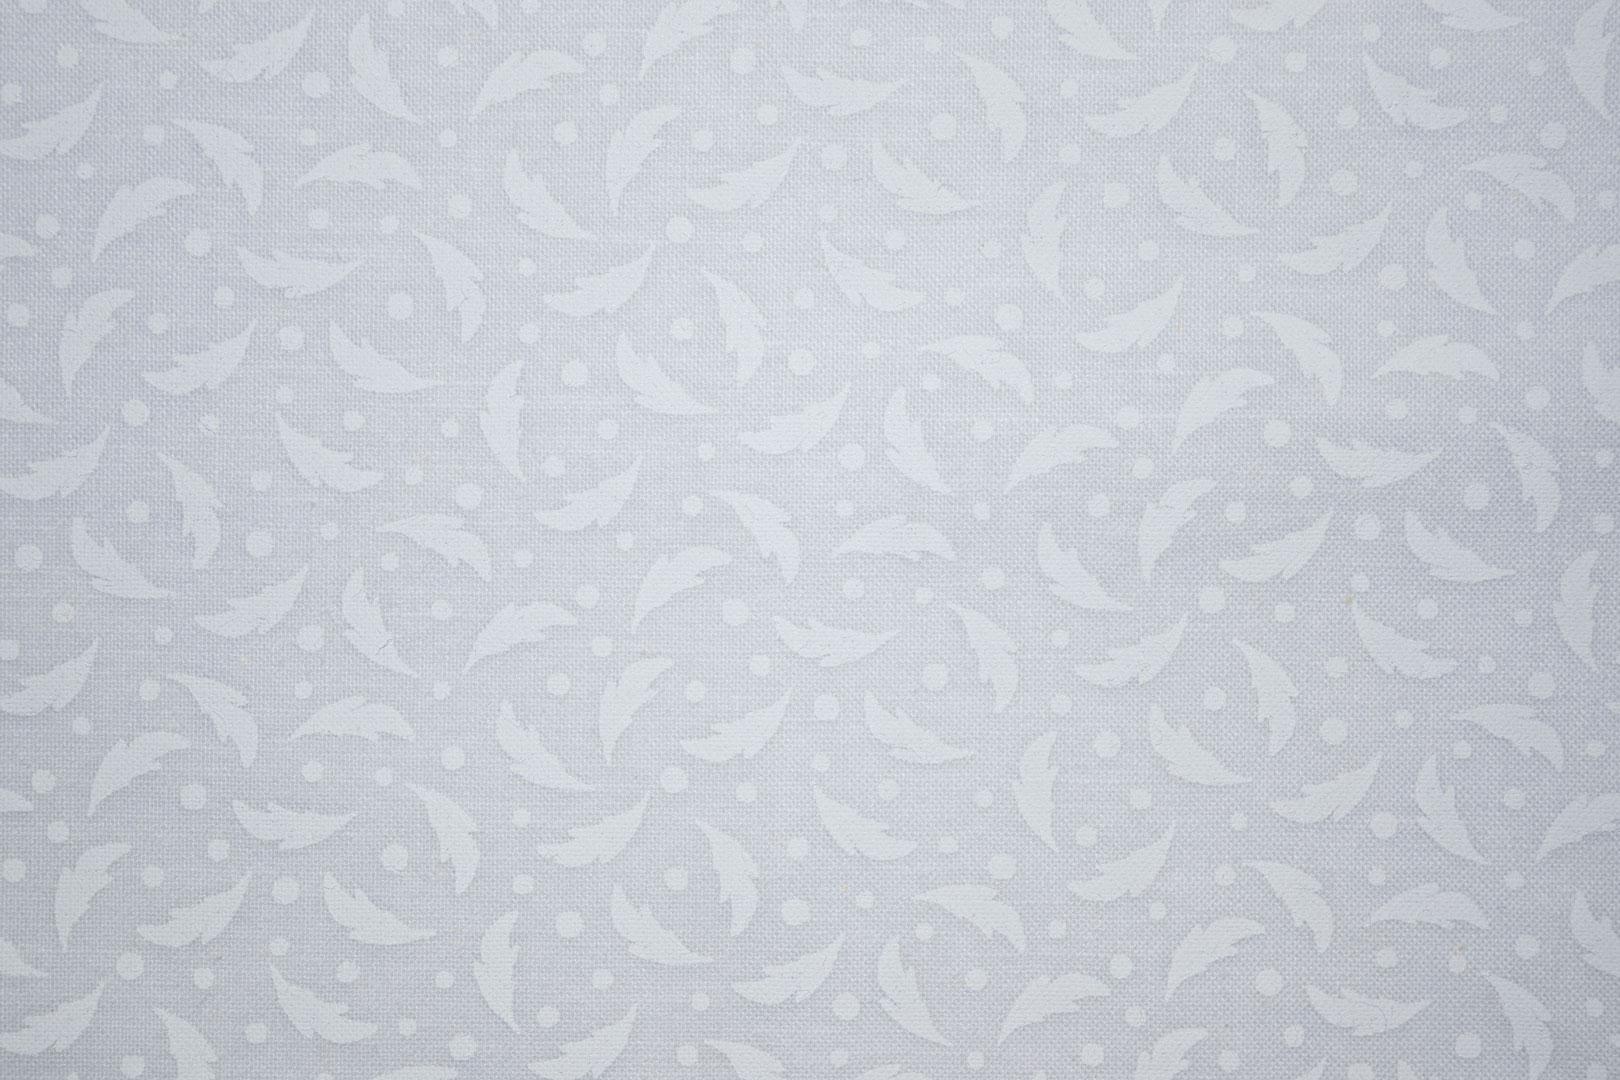 "149_47717_ww   45"" 68/68, 100% Carded Cotton"